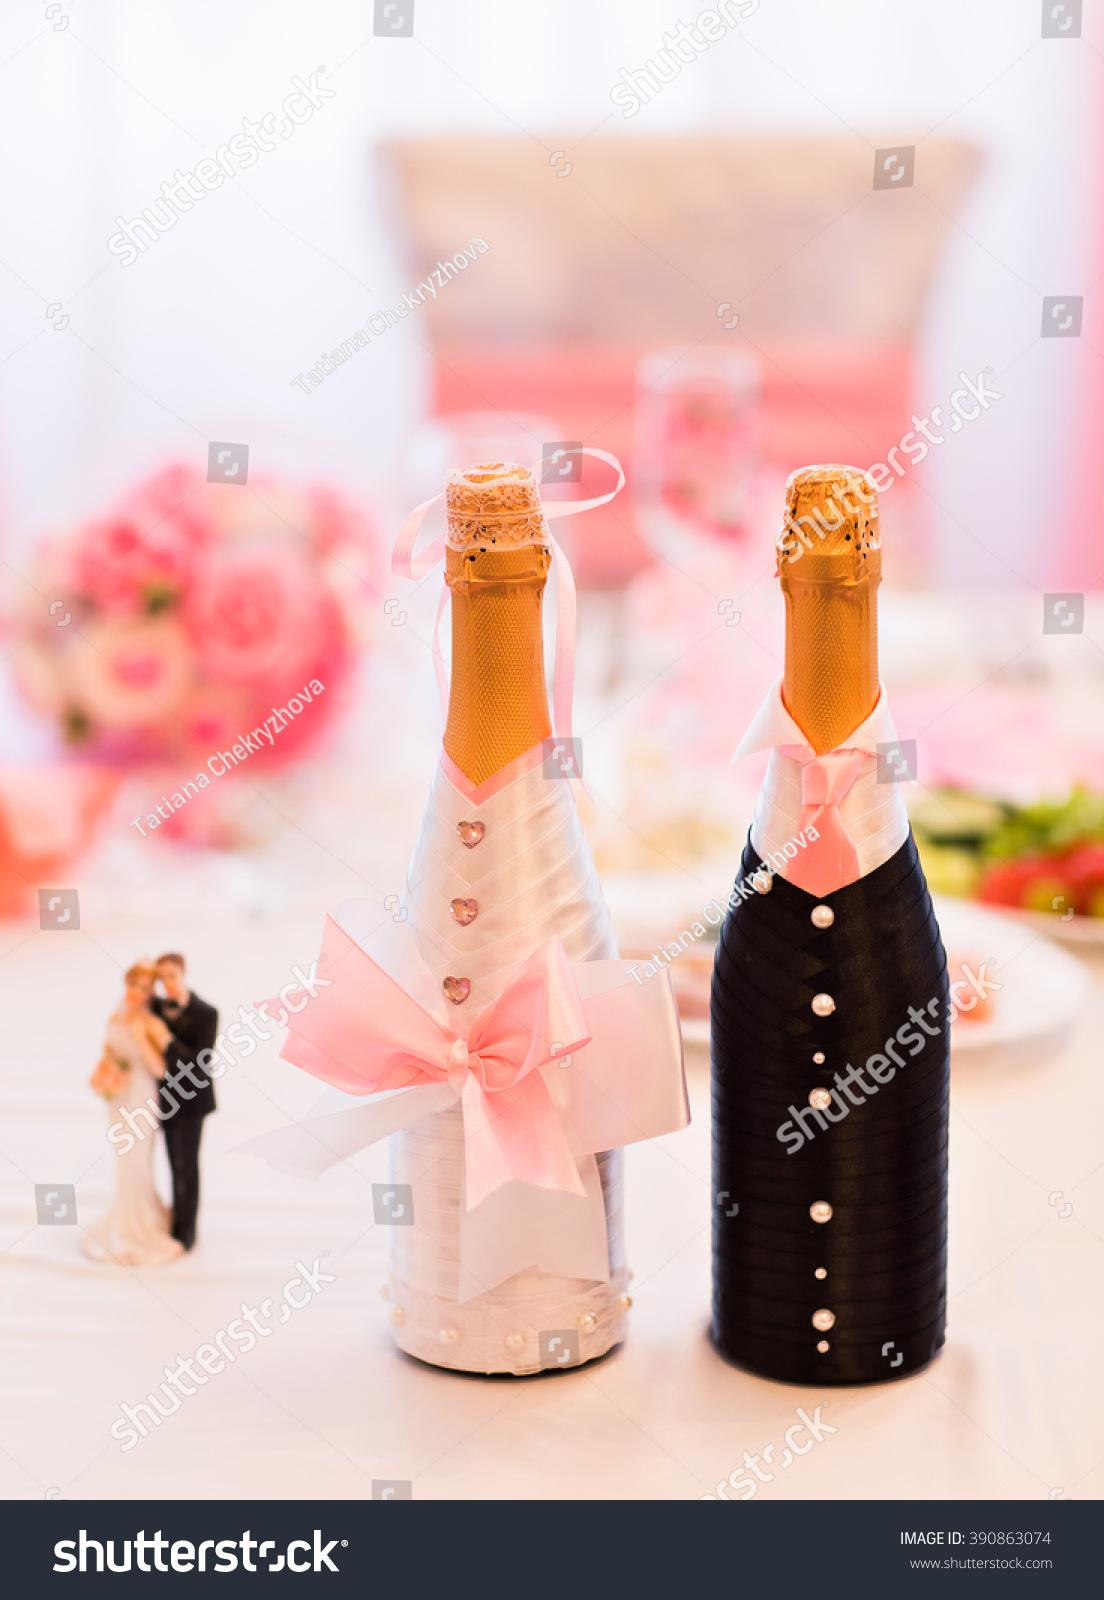 Champagne Bottle Decoration Champagne Bottles Decoration Wedding Day Stock Photo 390863074